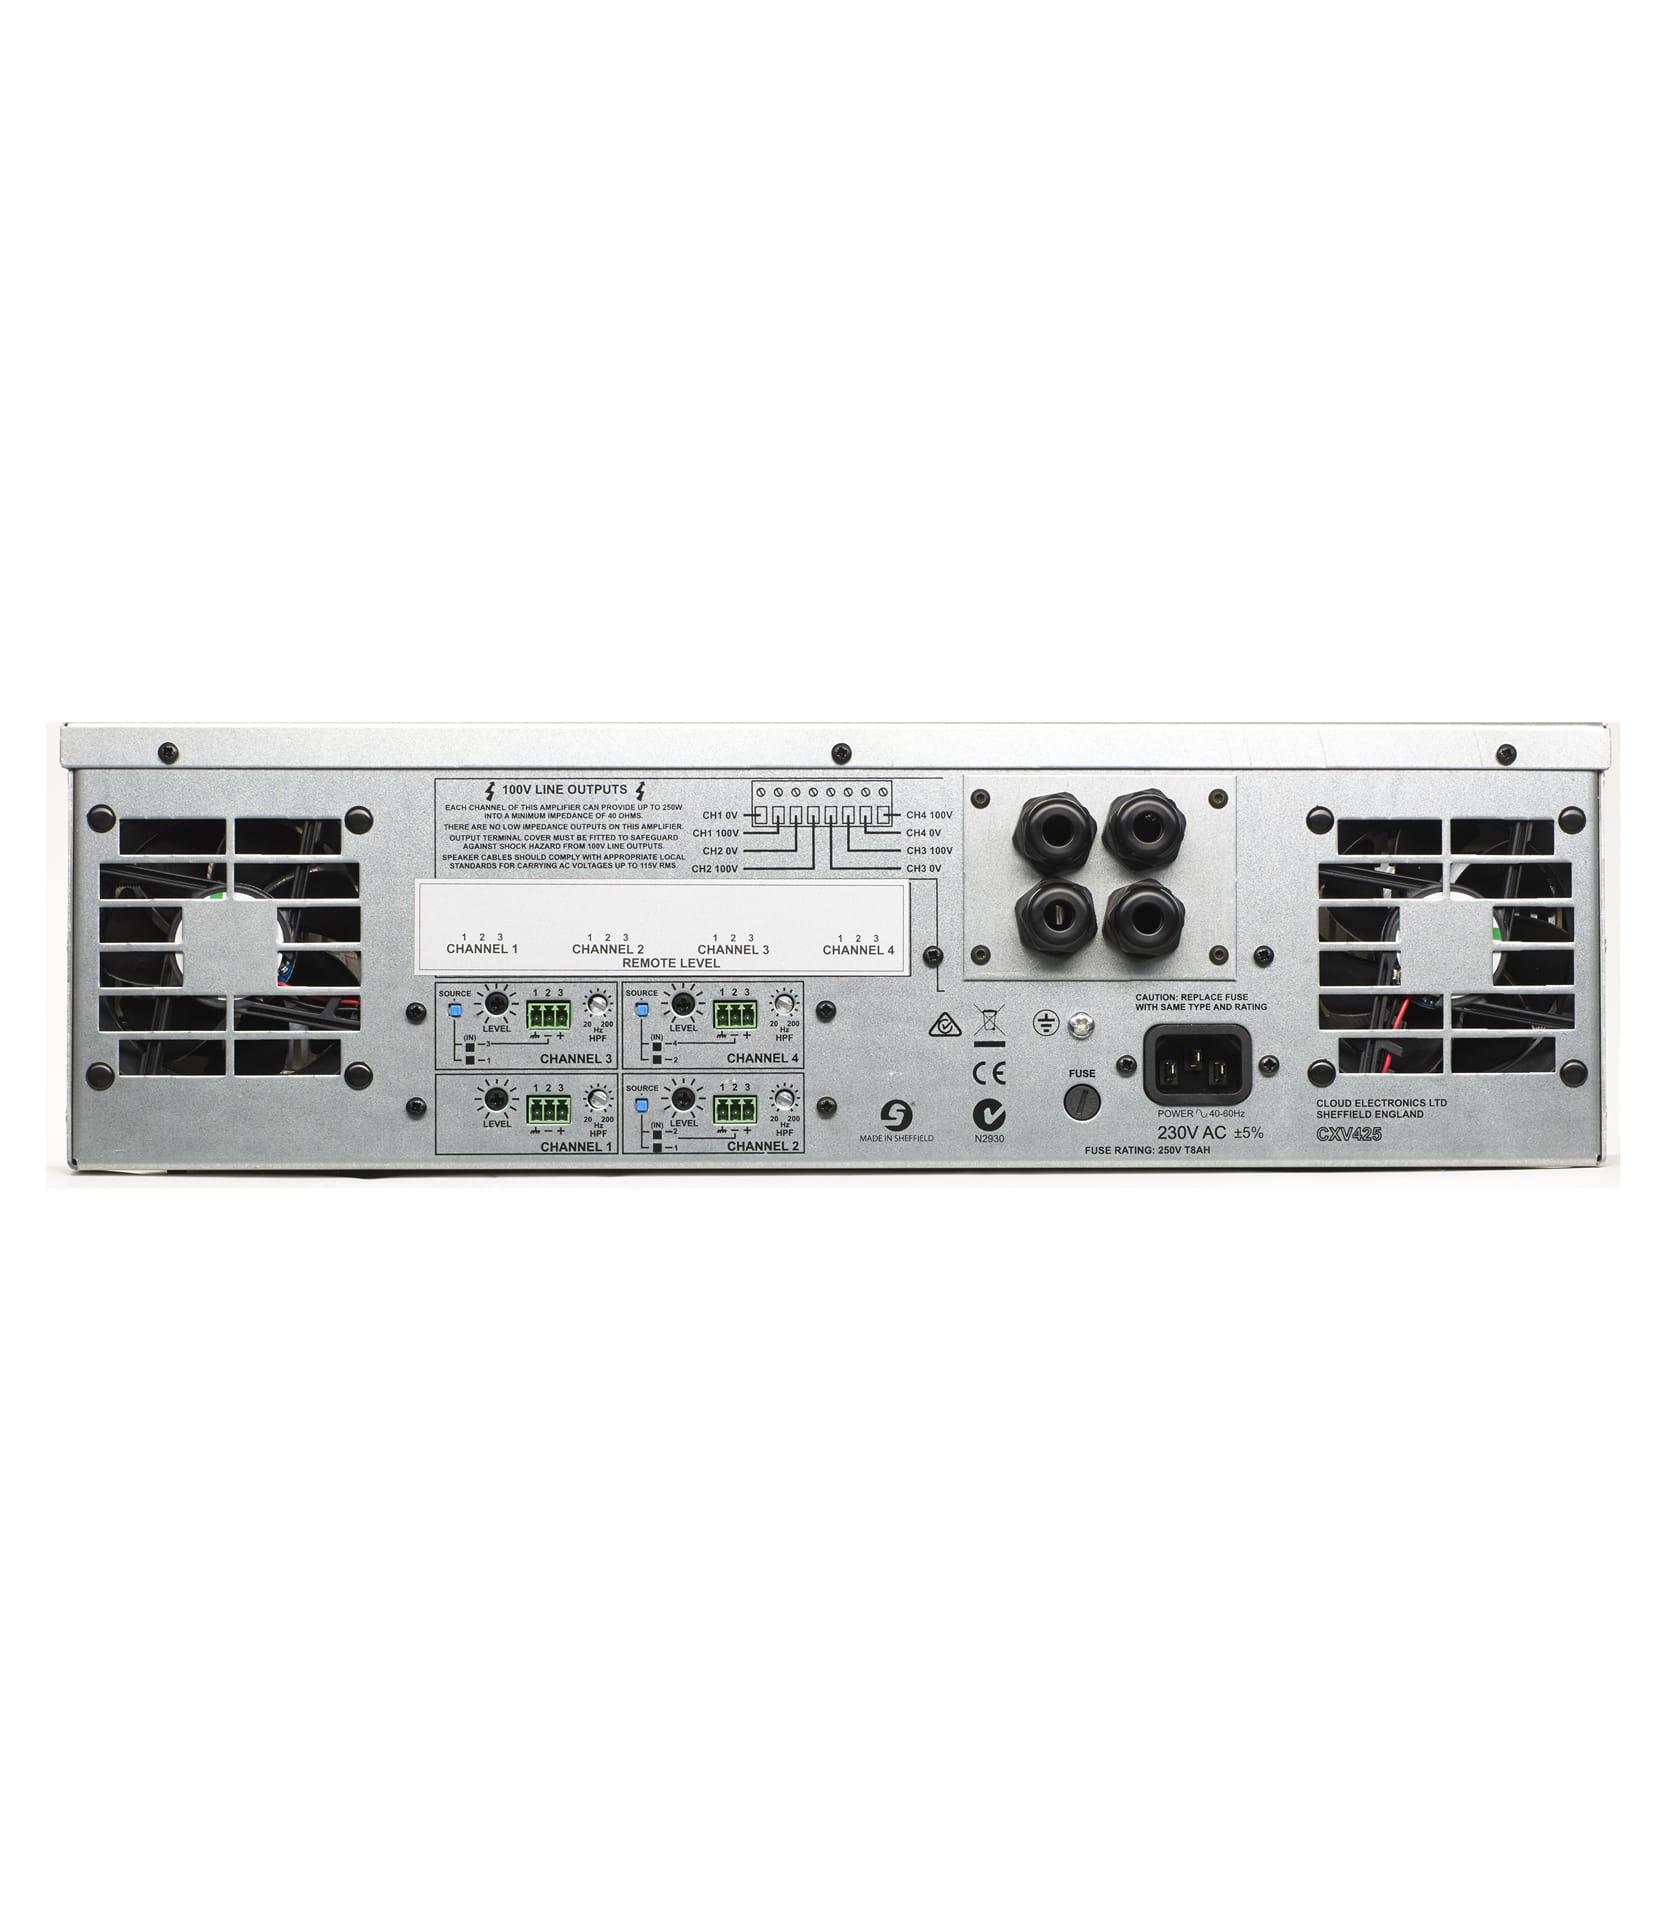 CXV425 - Buy Online